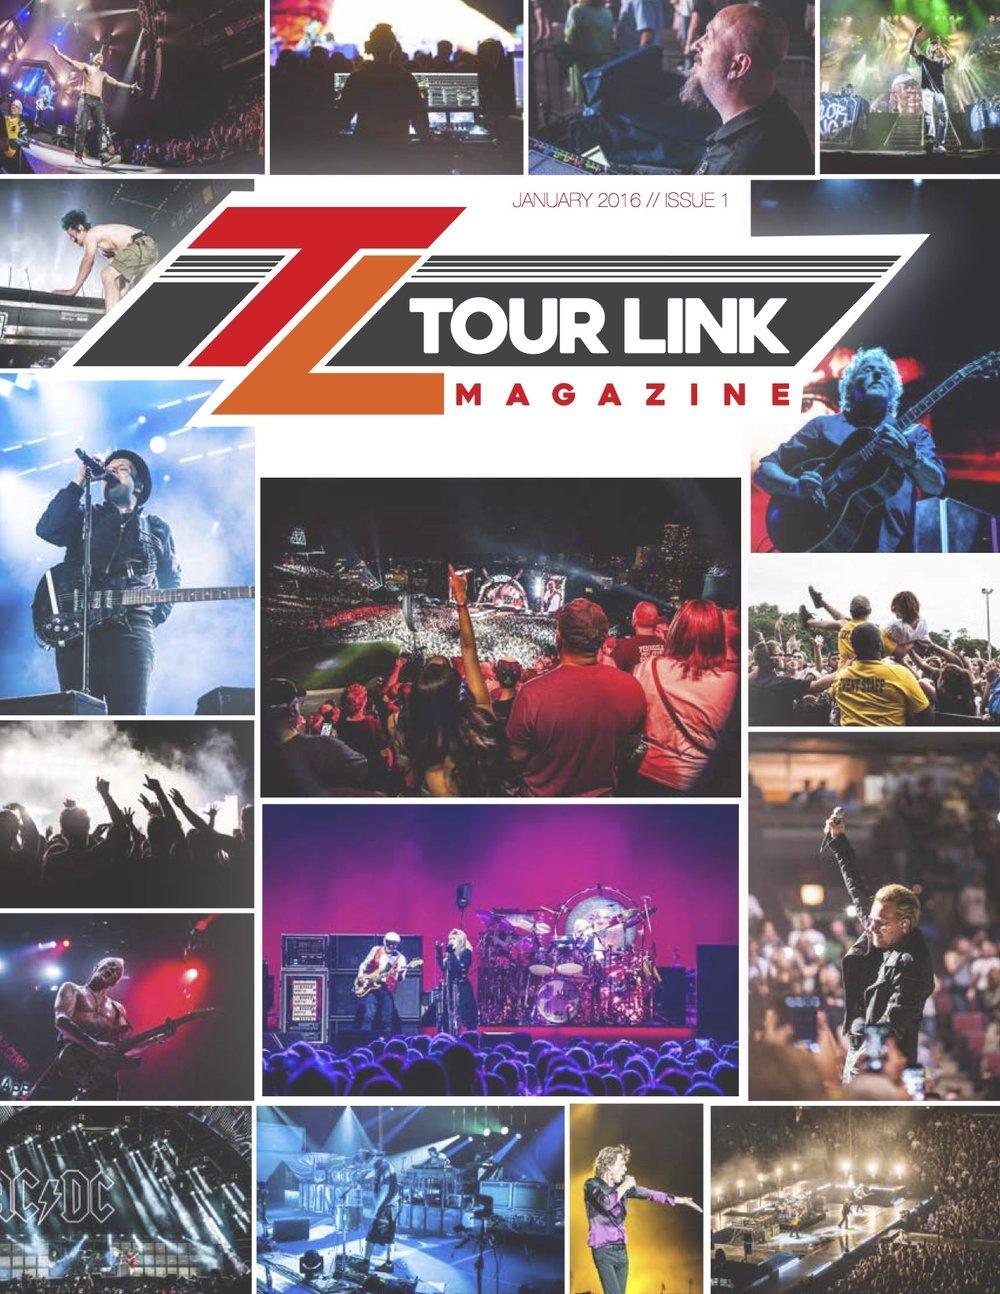 Tour Link Magazine, Issue 1